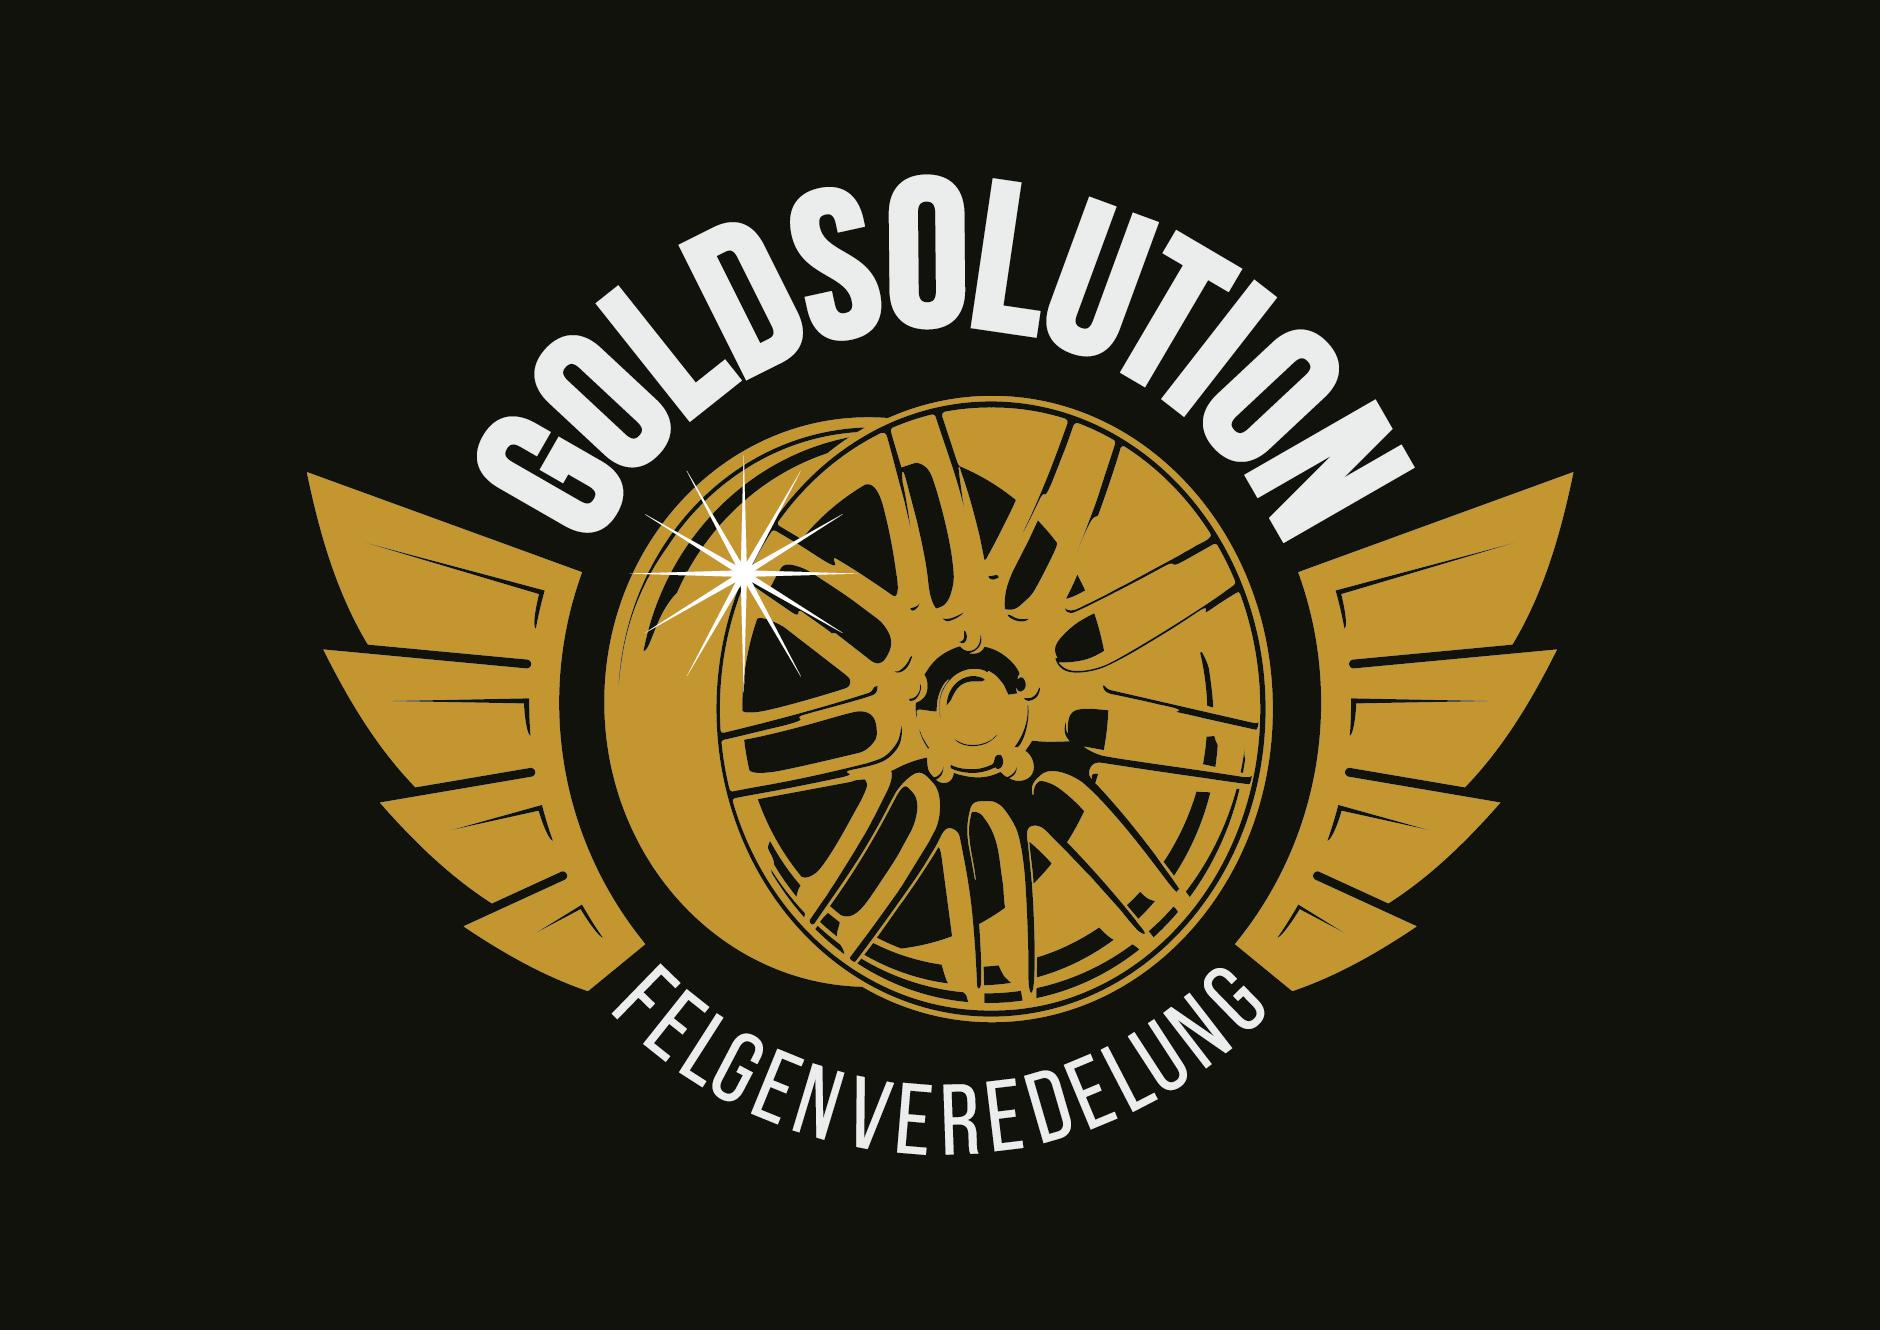 GOLDSOLUTION logodesign schwarz-Logodesign Goldsolution